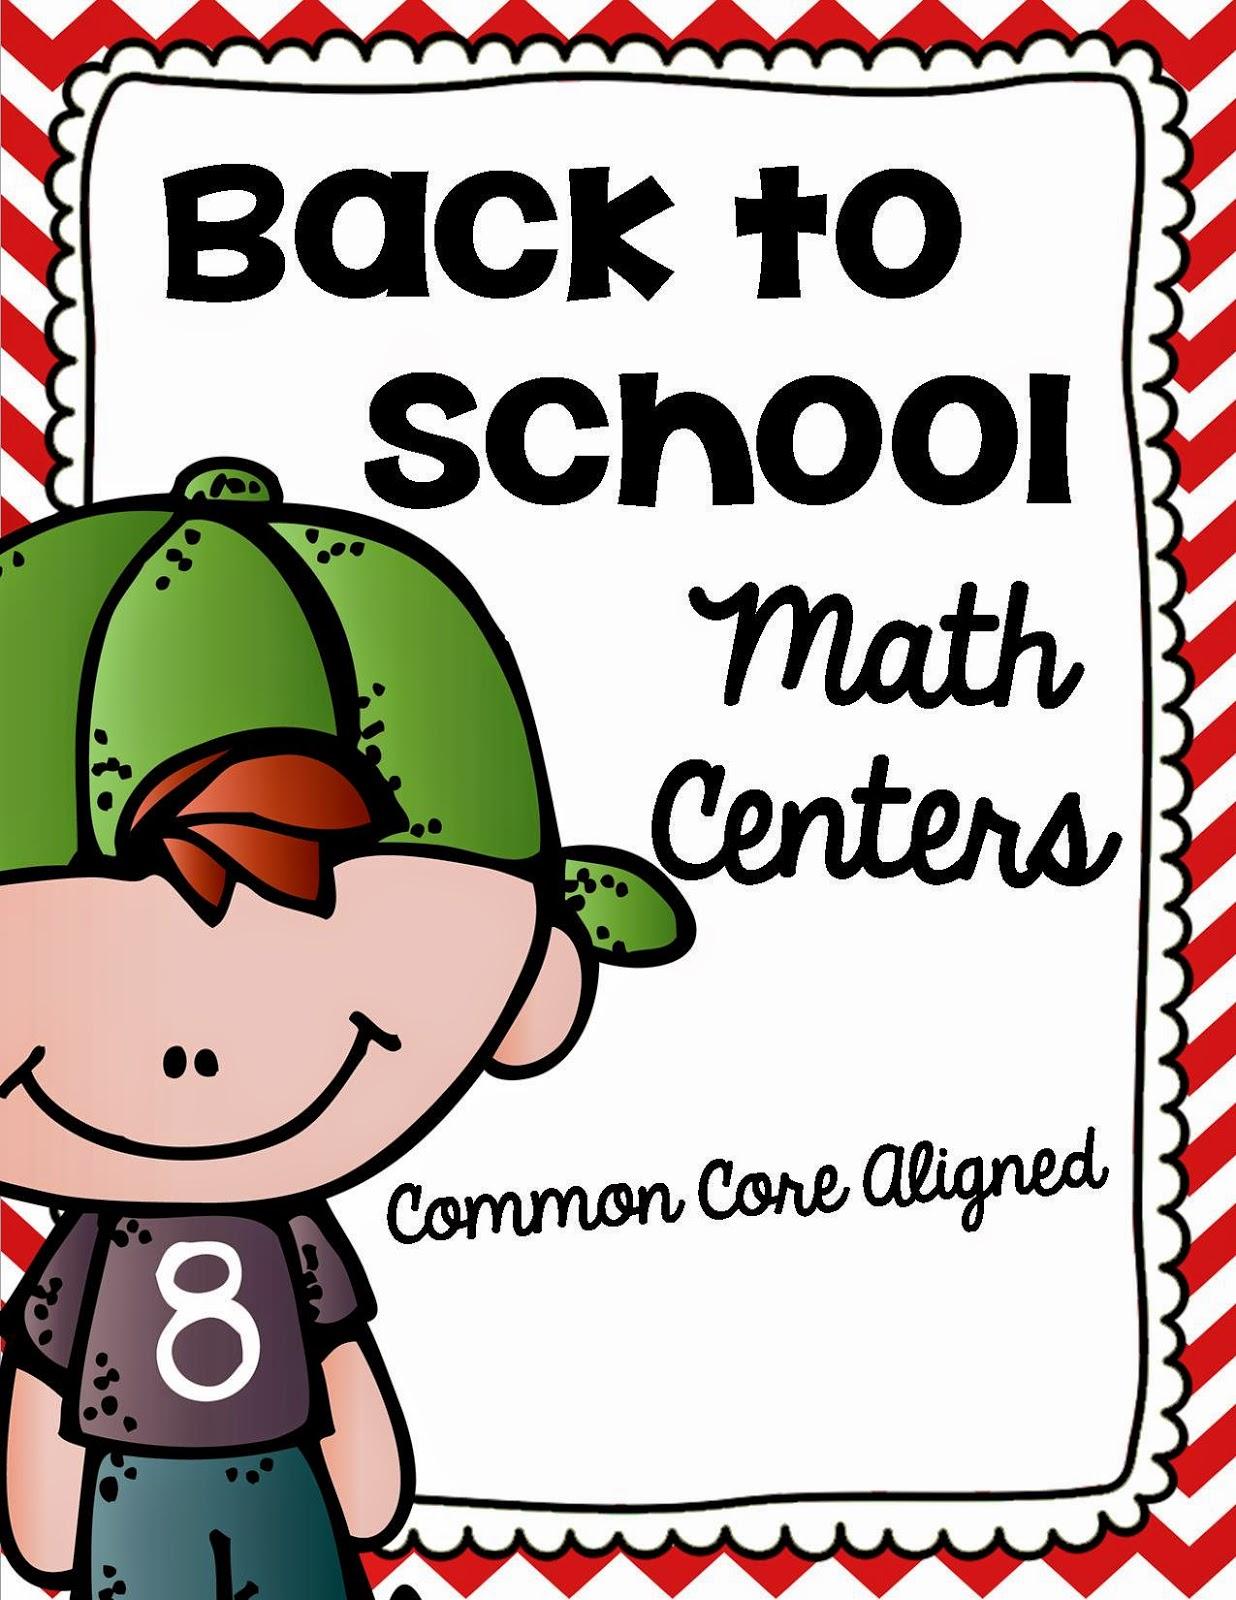 http://www.teacherspayteachers.com/Product/Back-to-School-Common-Core-Math-Centers-281929